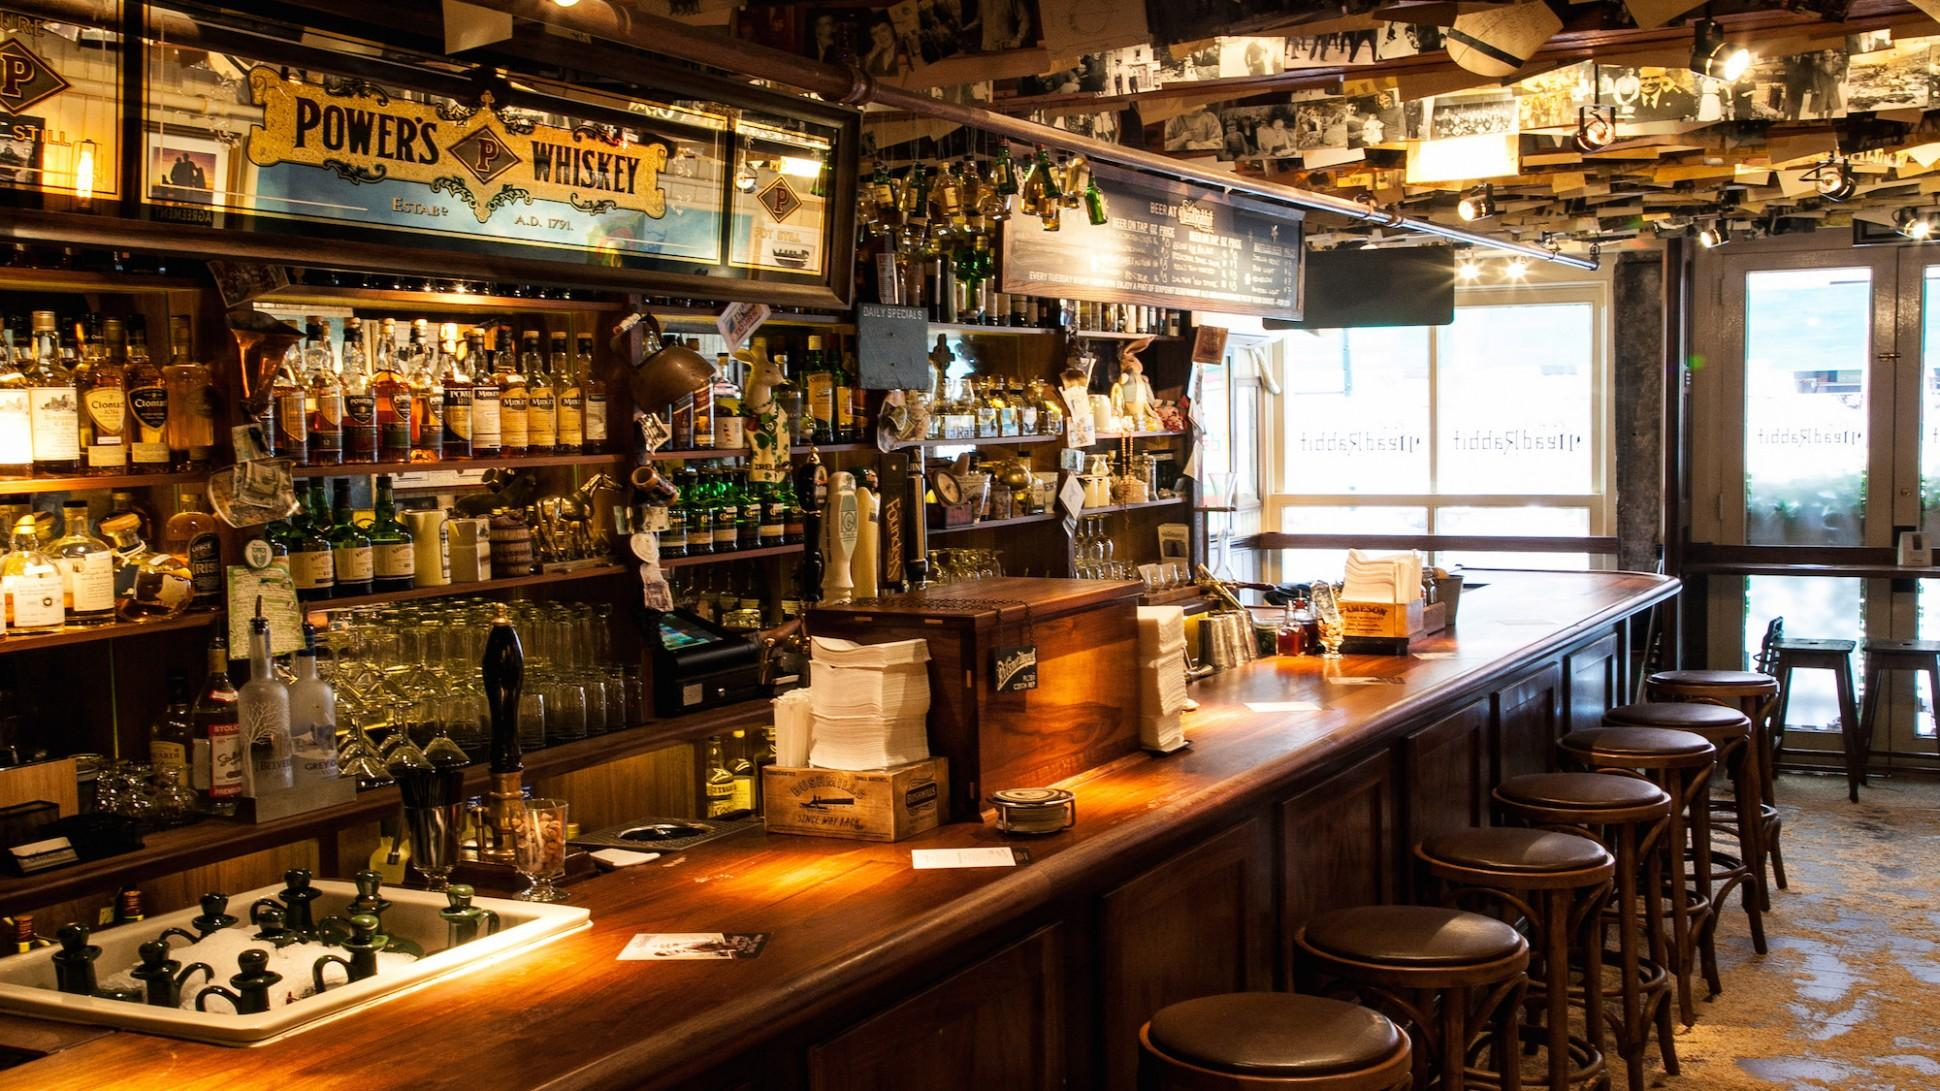 Best Bars in the World - best bar in new york - dead rabbit bar - dead rabbit - the best bar in the world - irish pubs - contemporary irish pub - best bars in the world - best bars in new york - best bars in paris - best bars